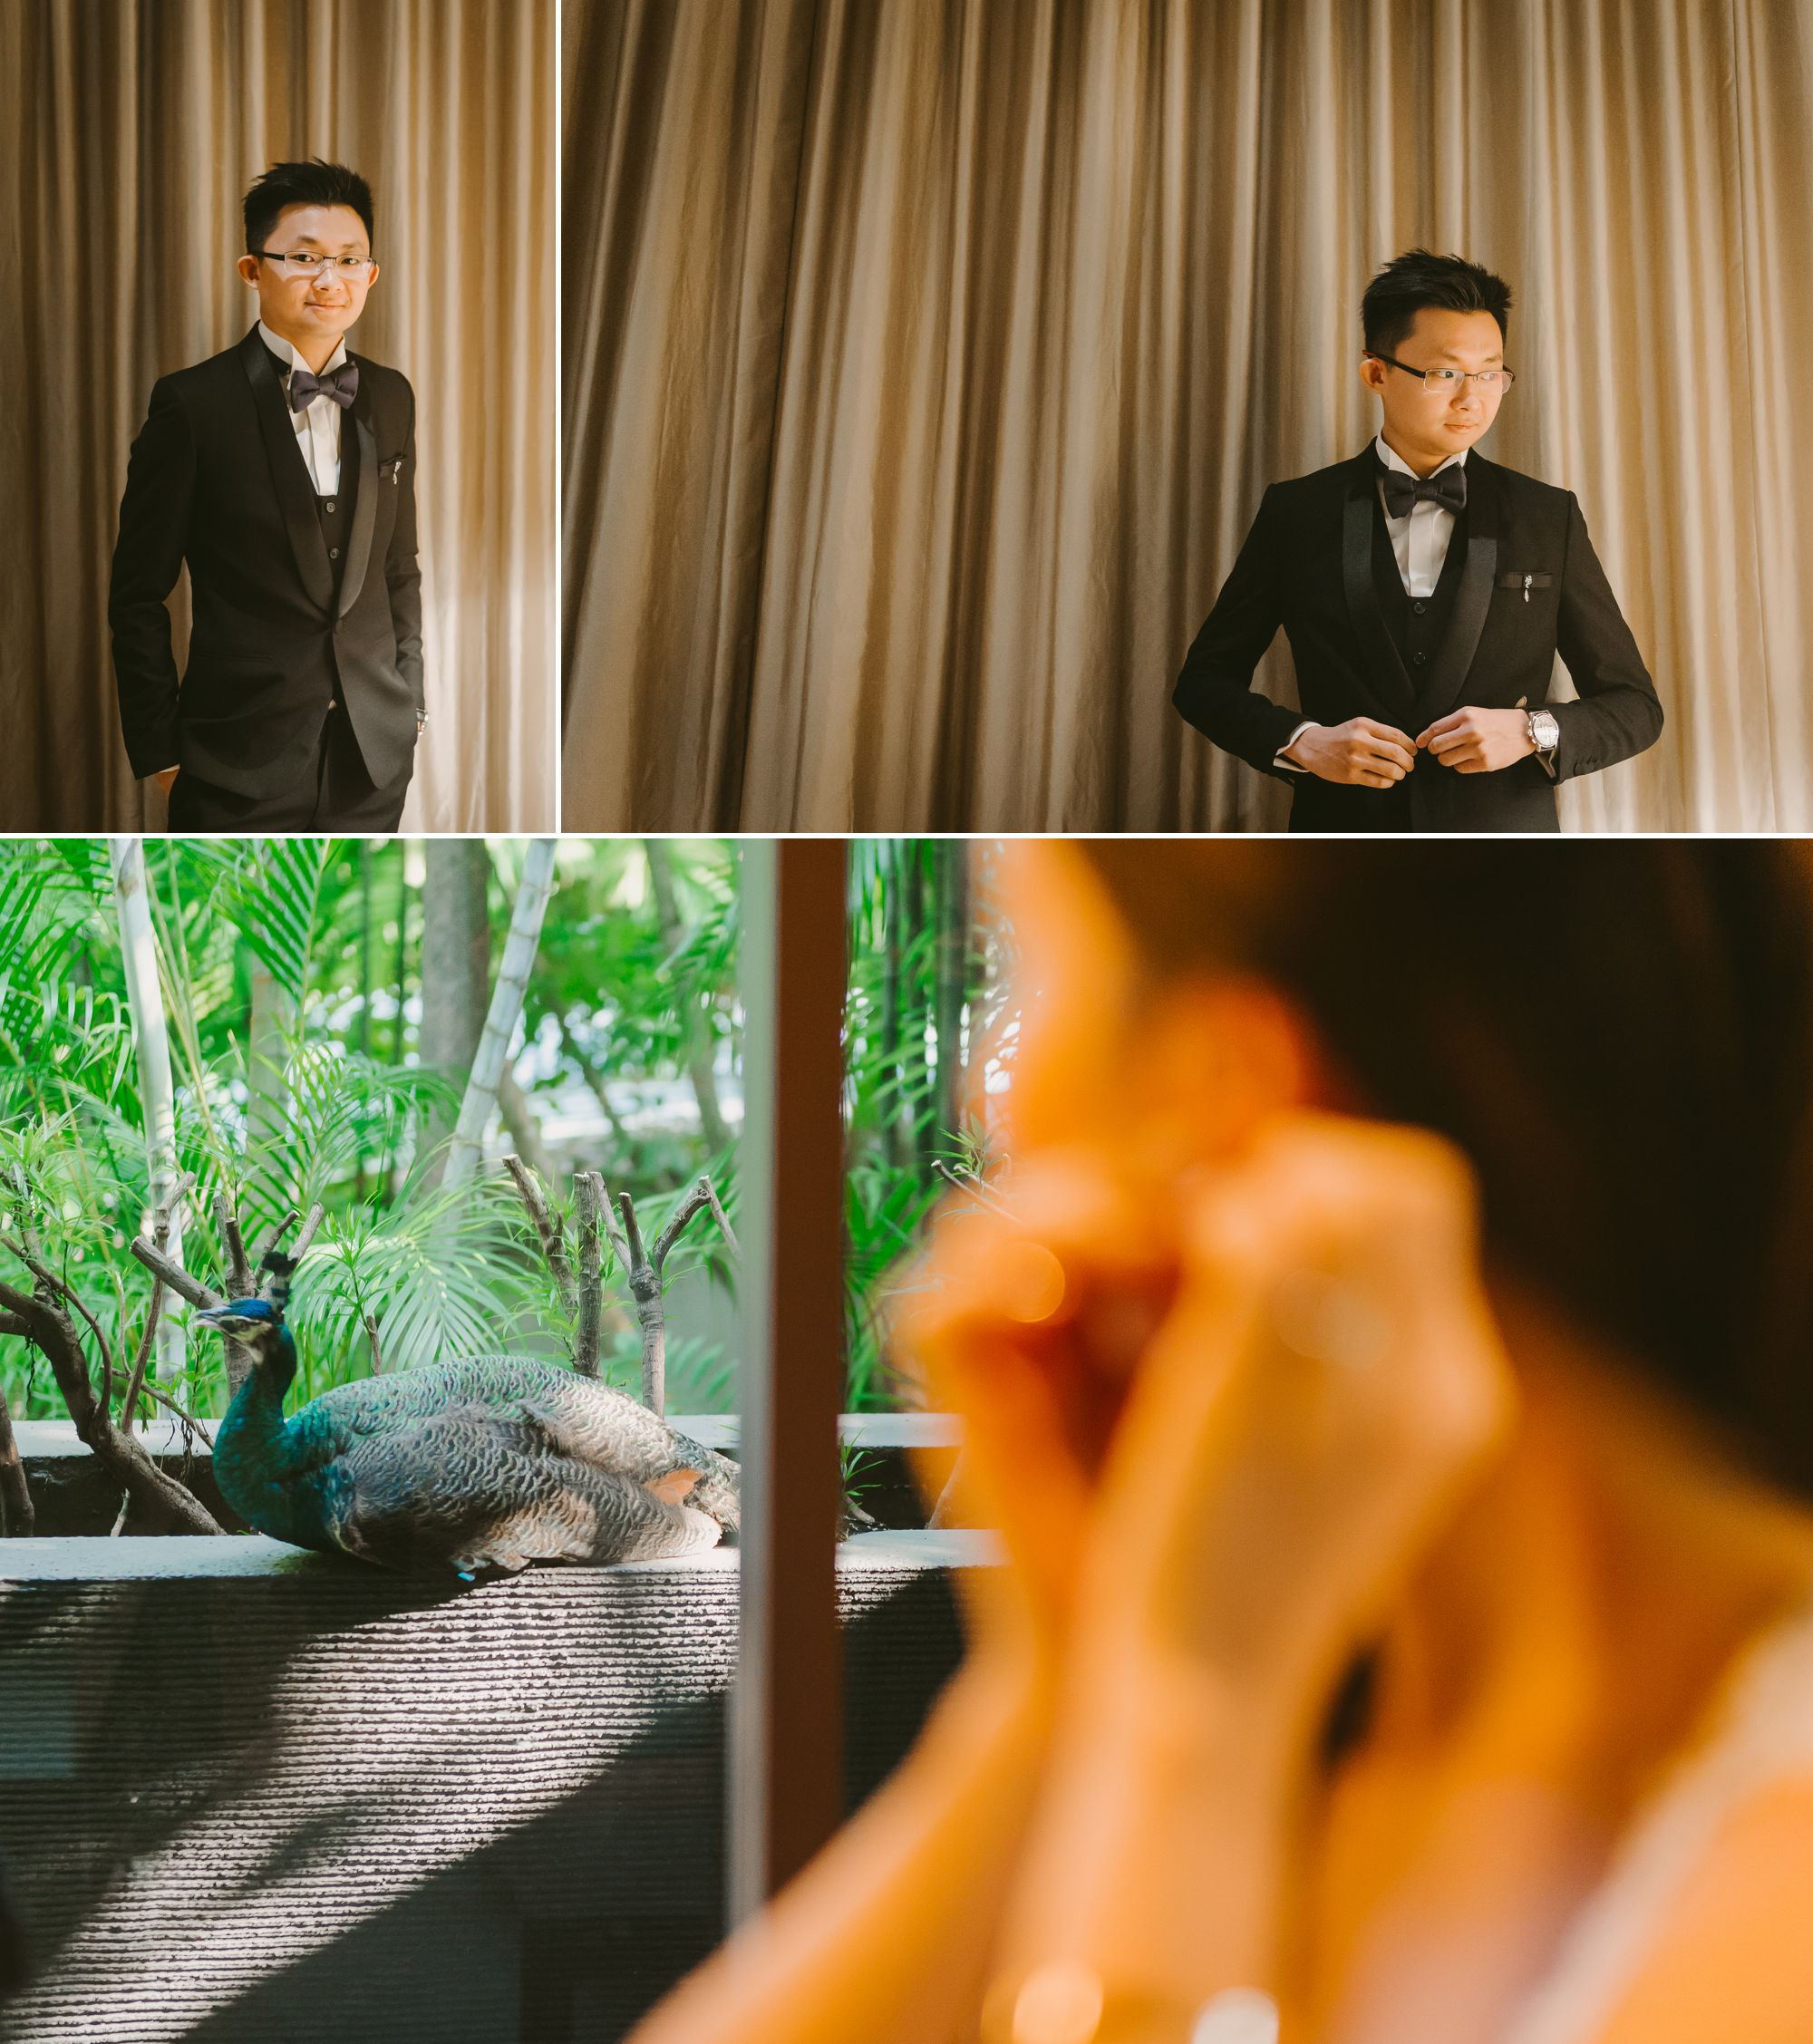 capella_singapore_wedding_ 23.jpg